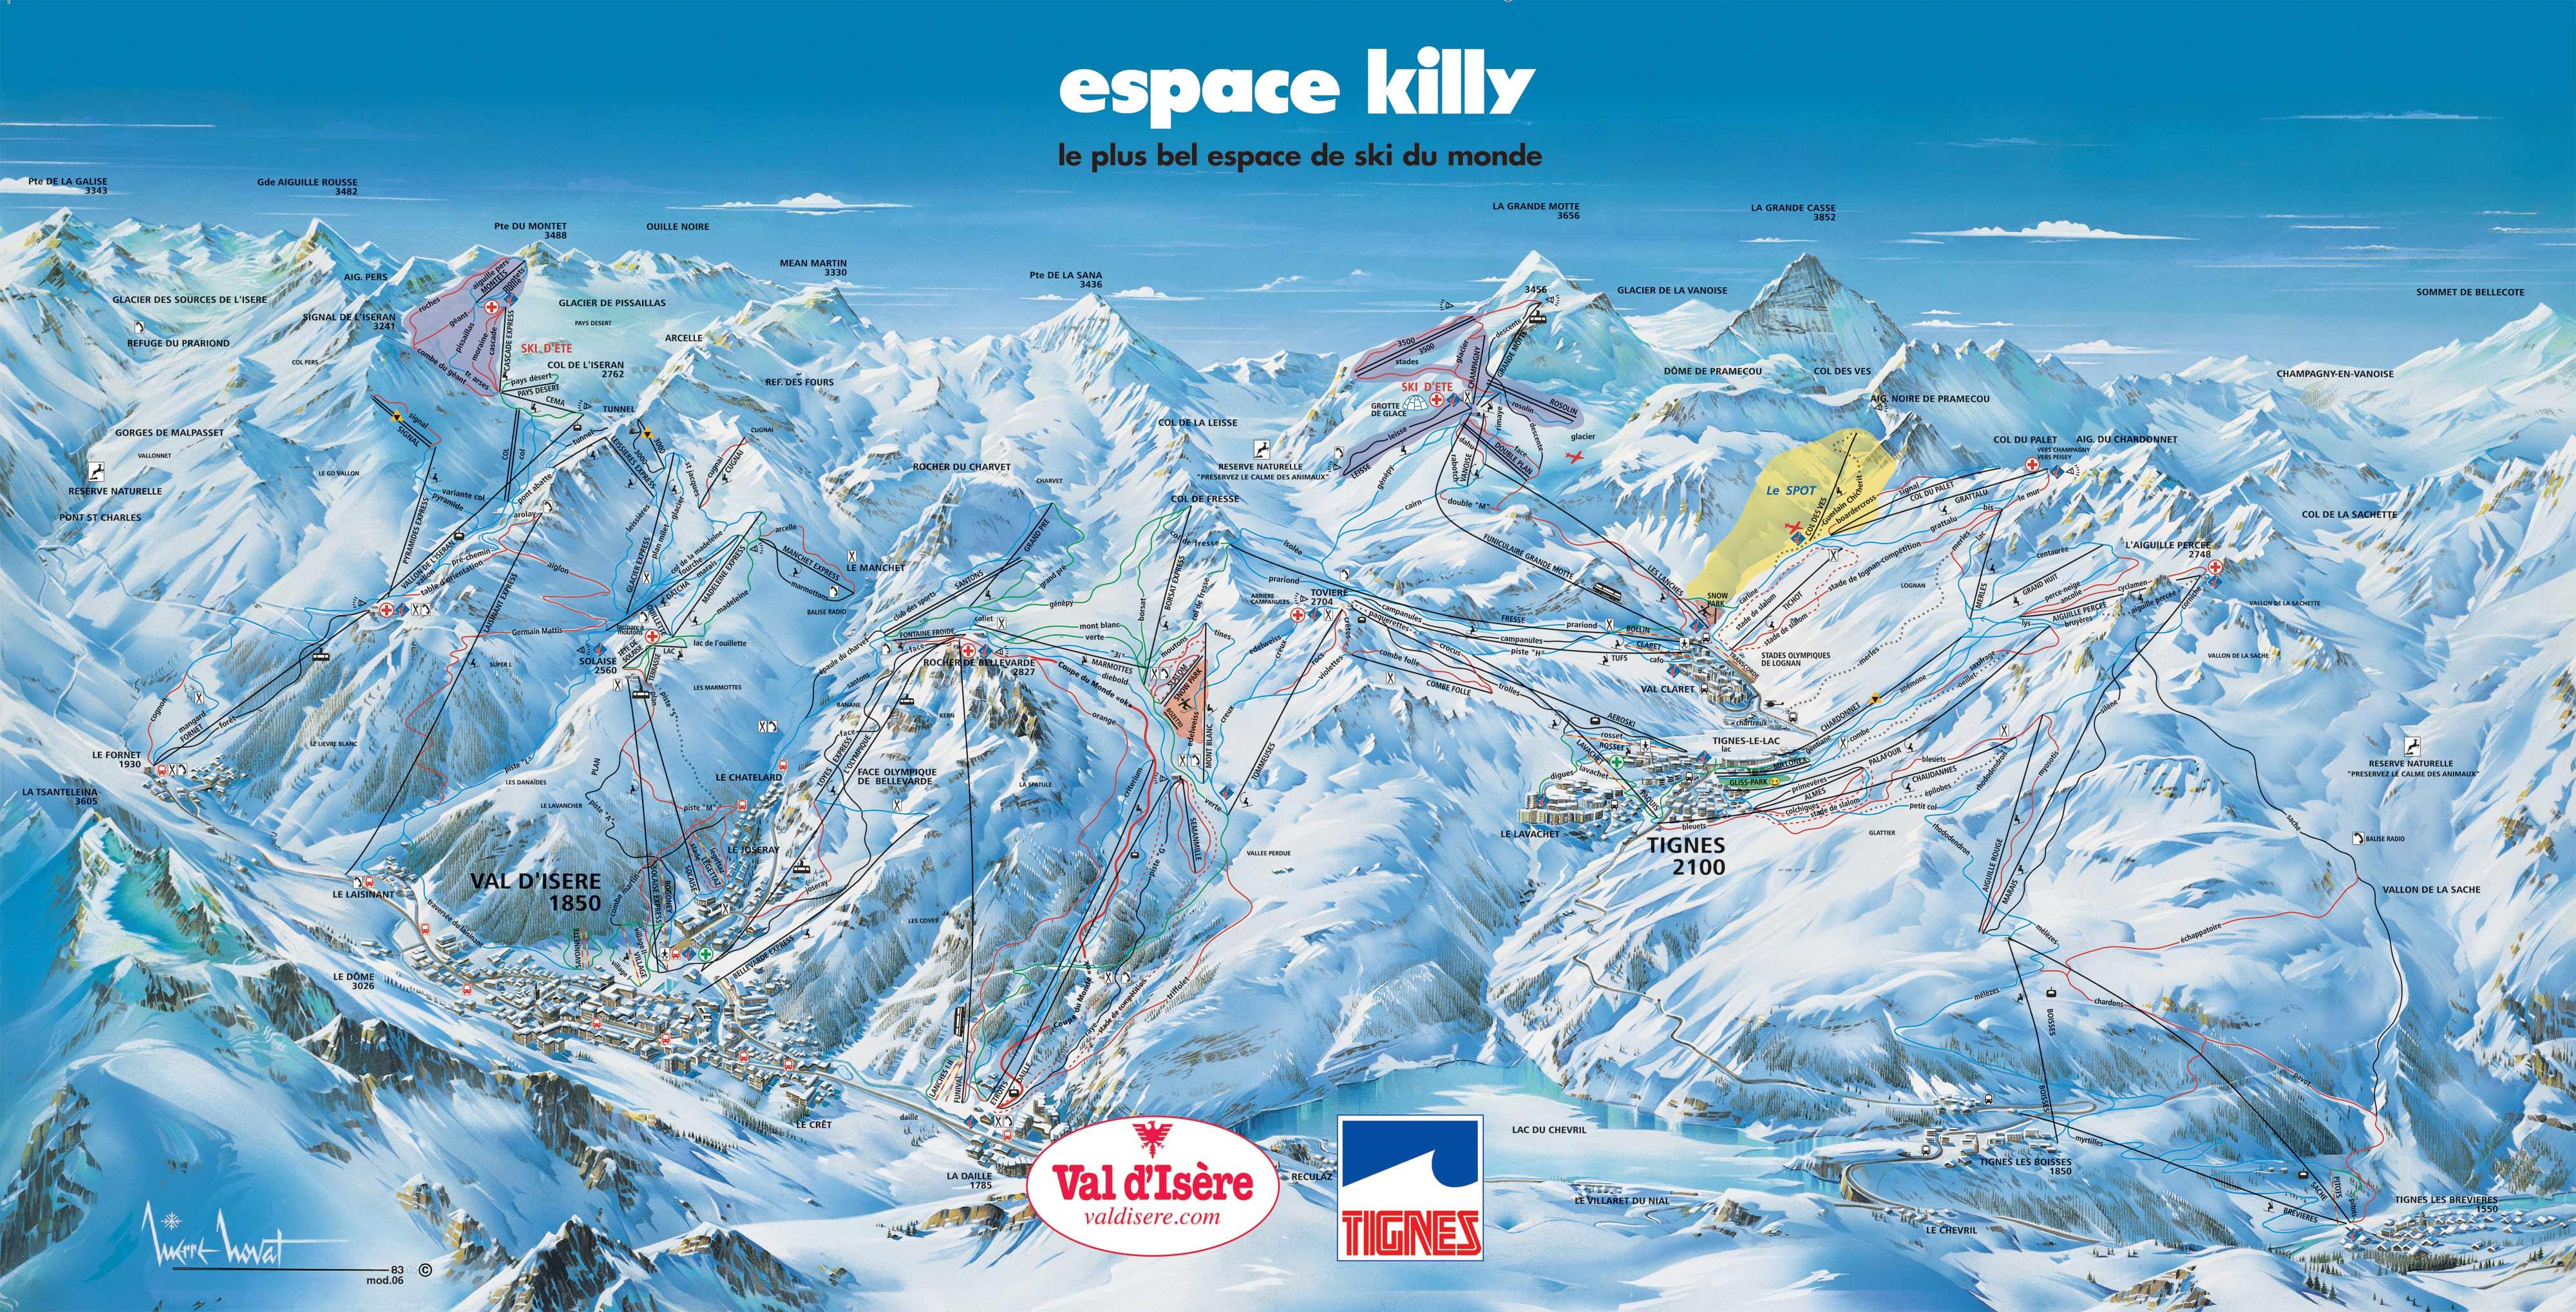 mapa pistas Val d'Isère y Tignes (sector Val d'Isere)